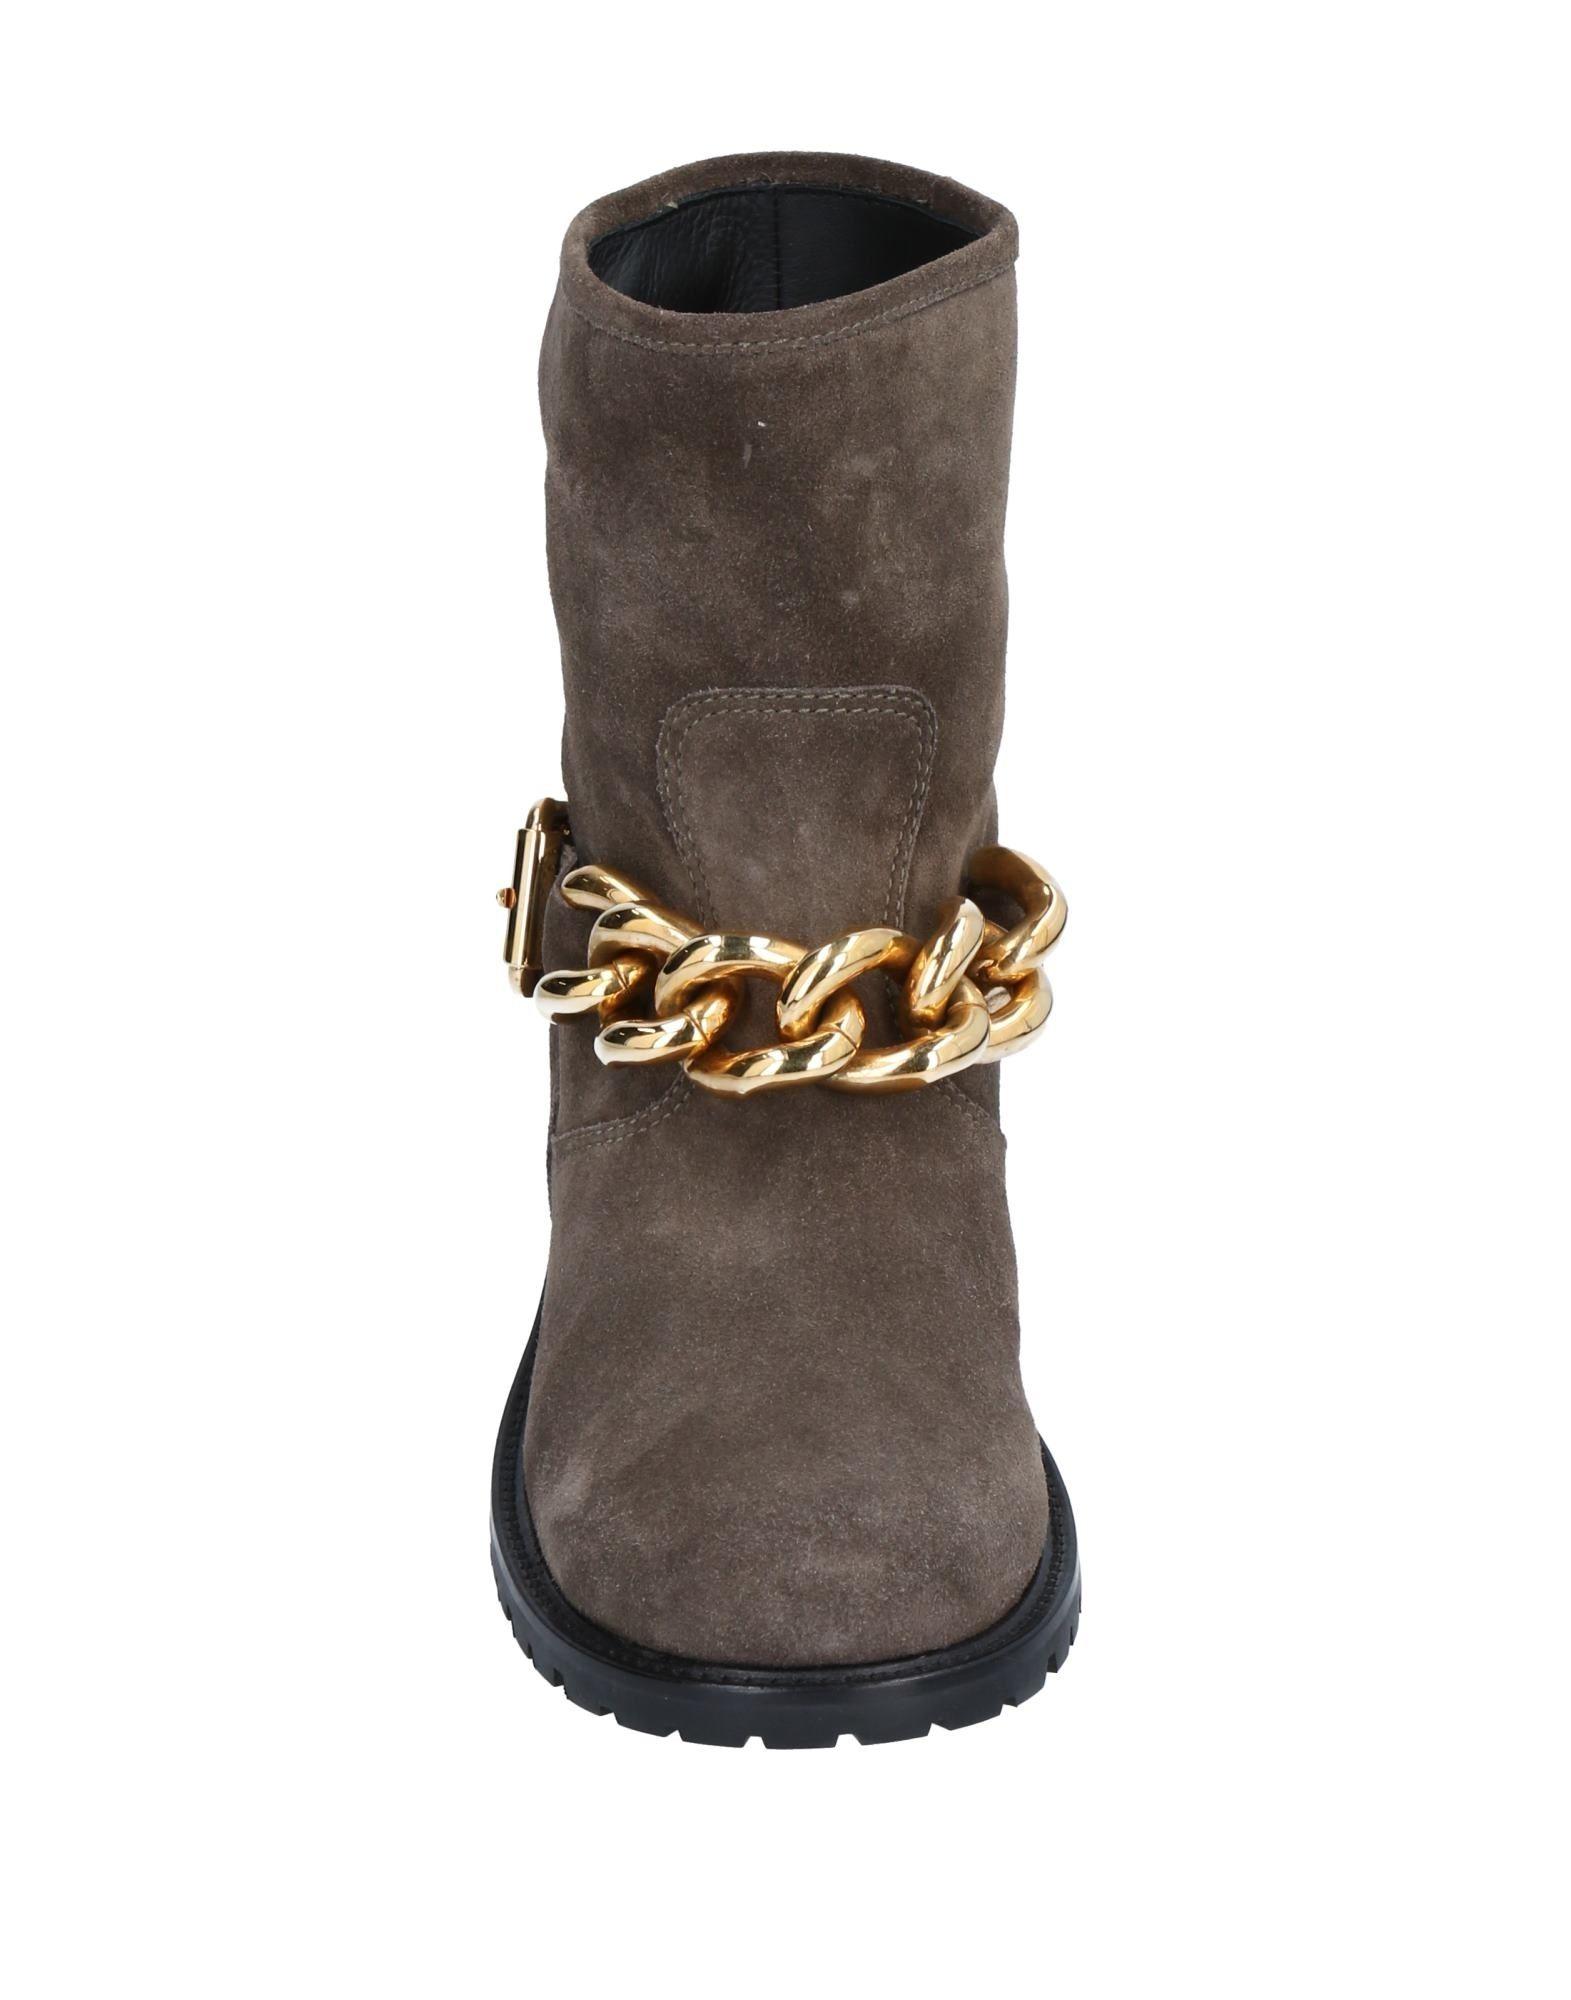 Giuseppe Zanotti Stiefelette Damen Schuhe  11529428EUGünstige gut aussehende Schuhe Damen 440808